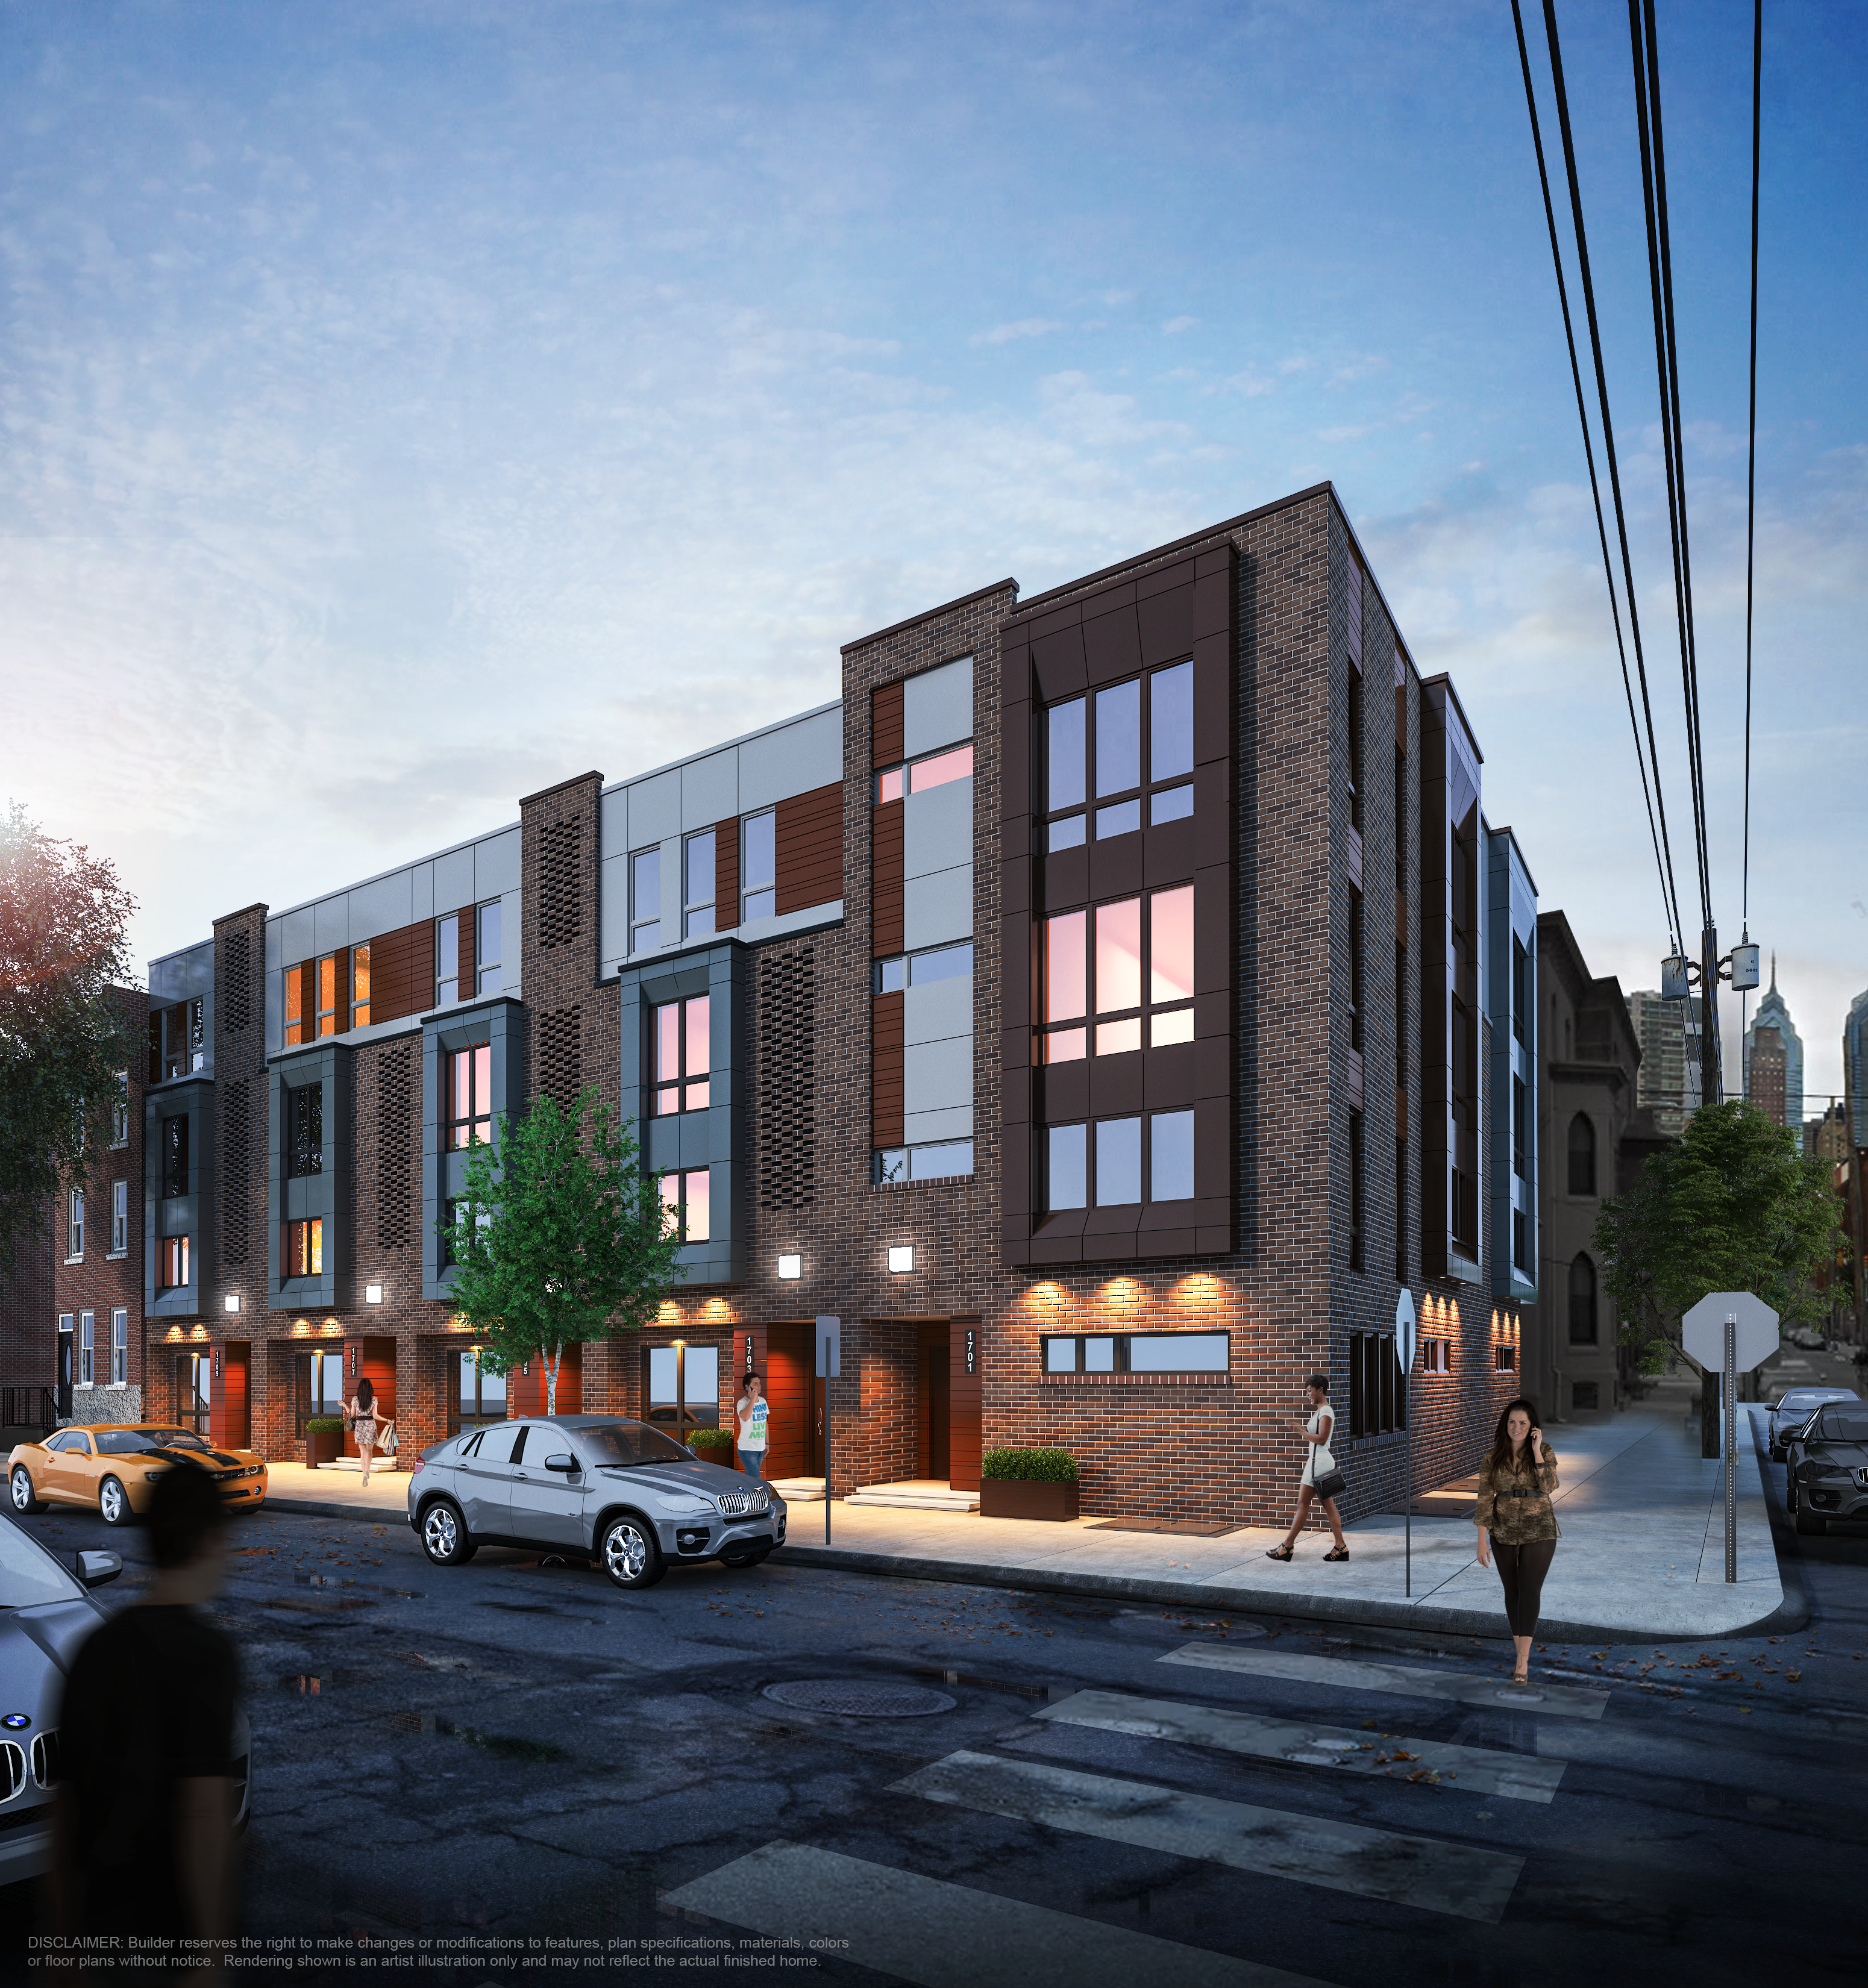 A rendering of a condo development in Philadelphia's Graduate Hospital neighborhood.